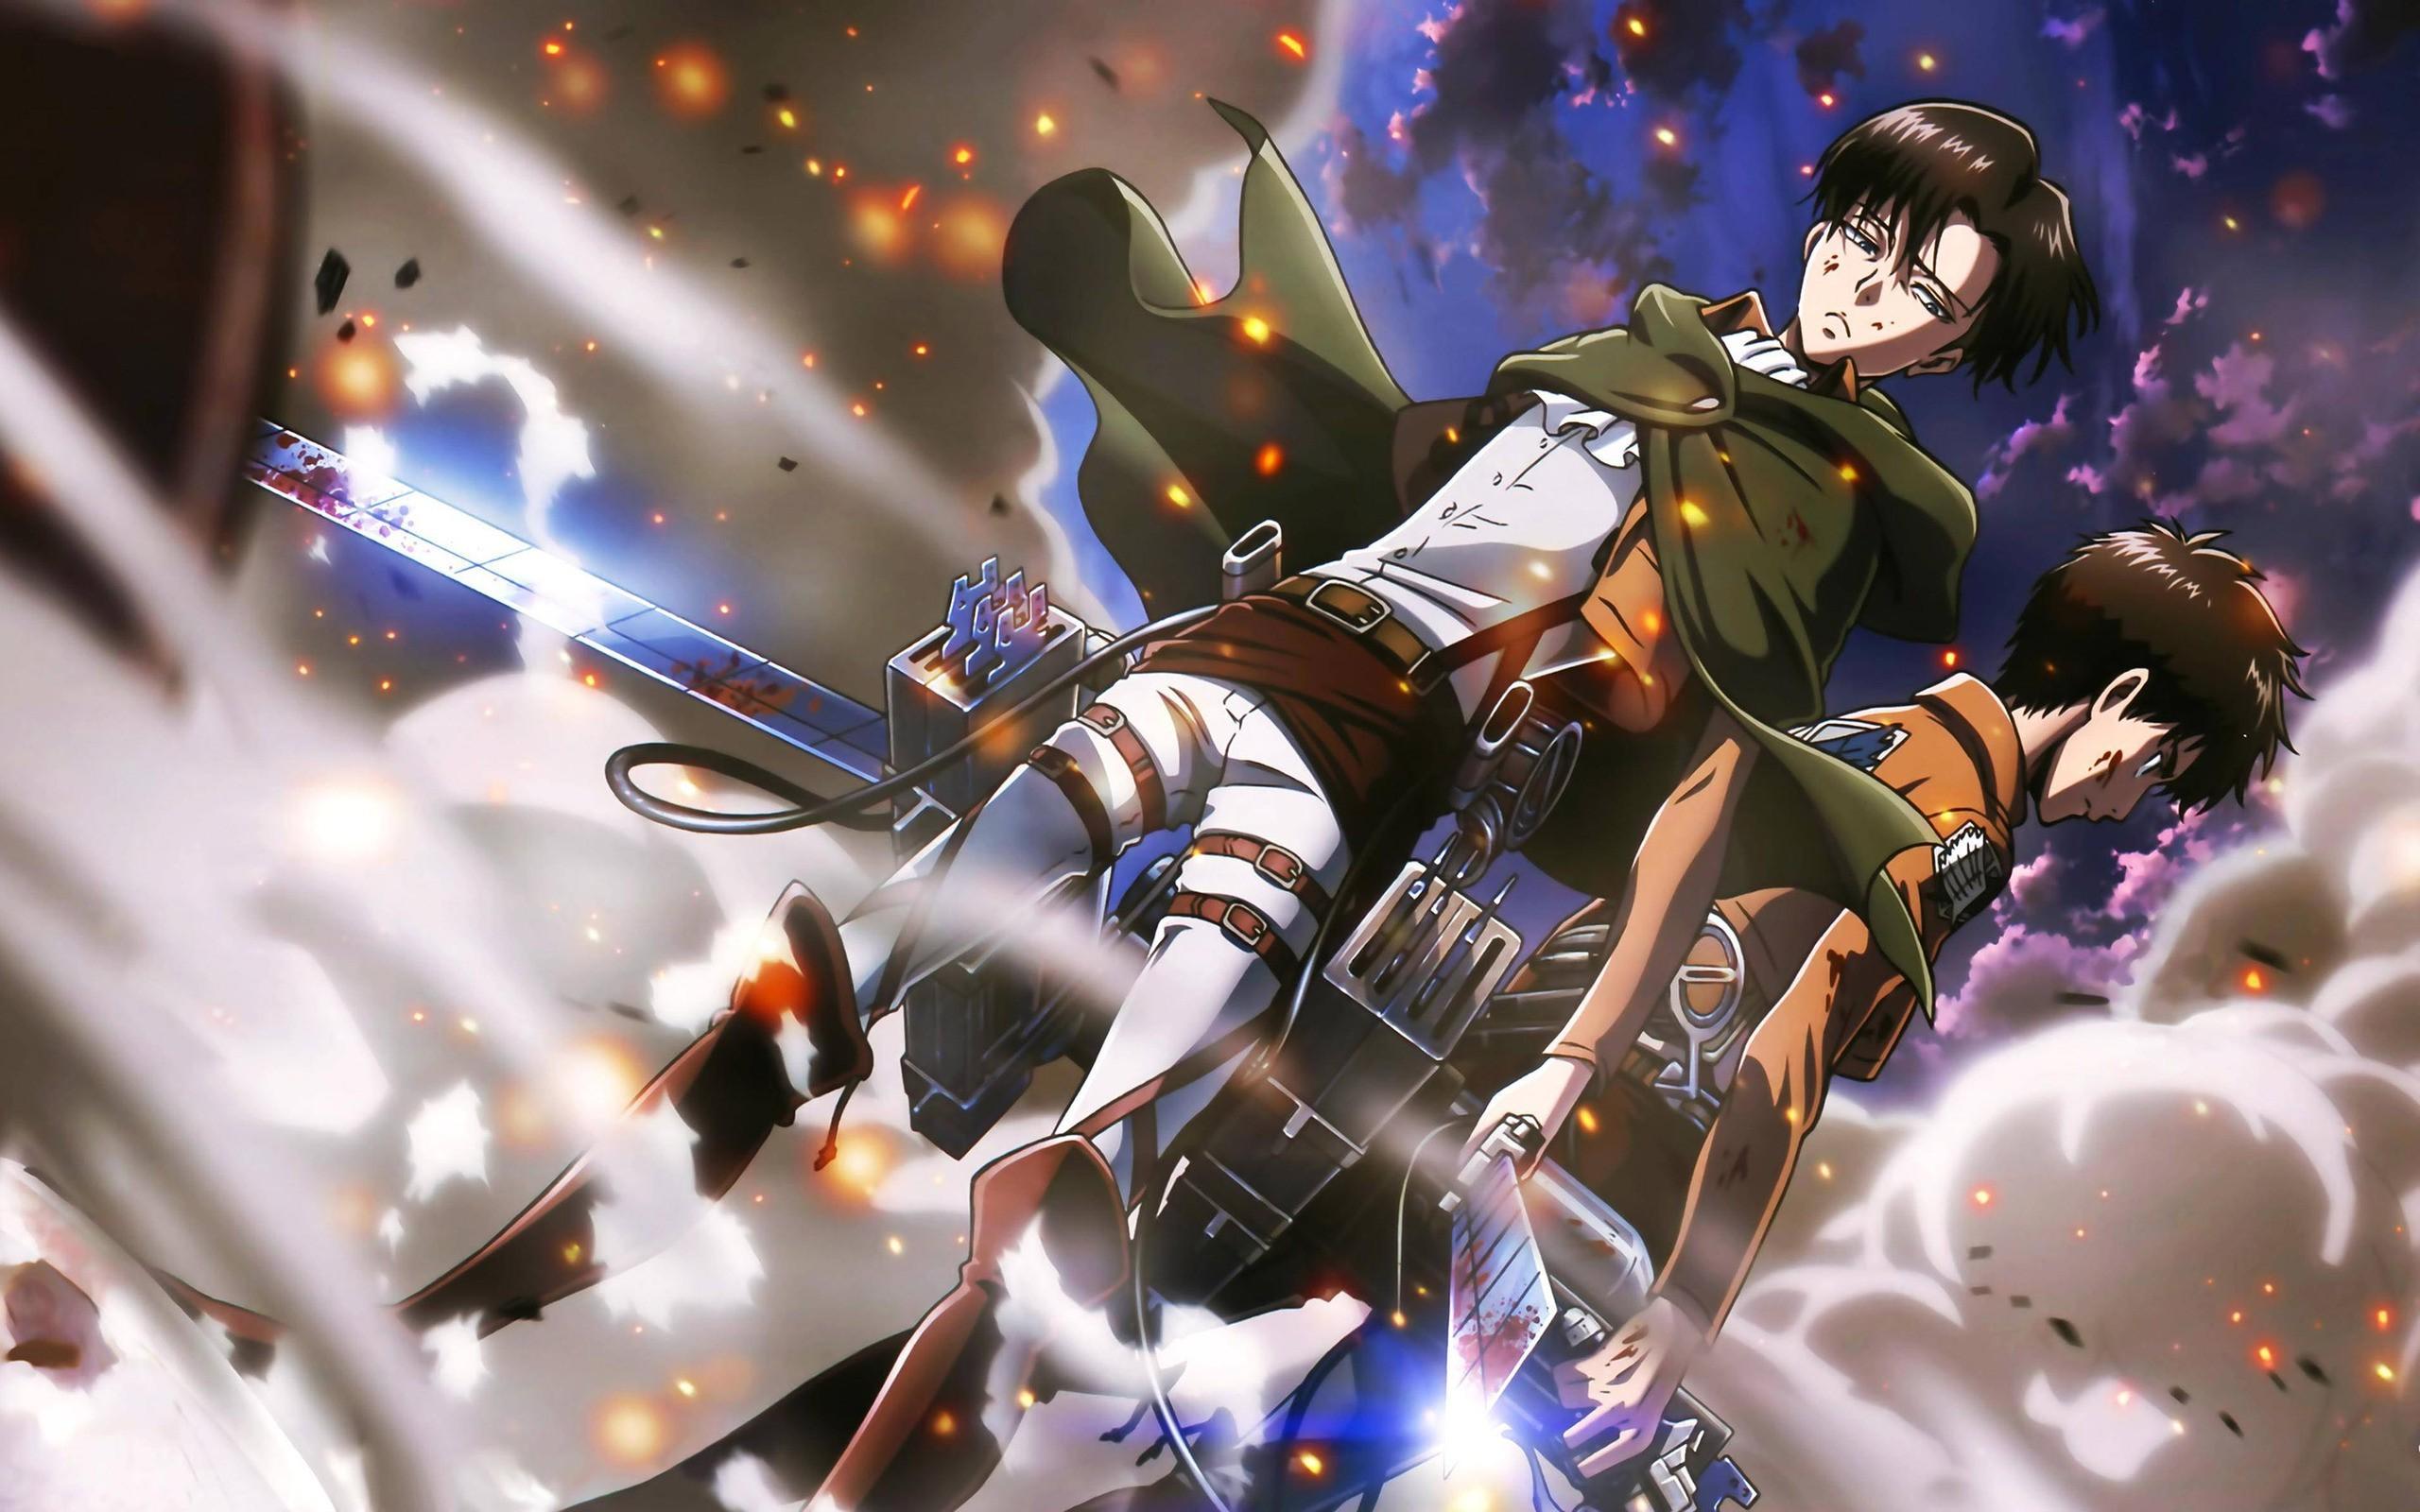 Fond D Ecran Anime Garcons Anime Shingeki No Kyojin Eren Jeager Levi Ackerman Capture D Ecran 2560x1600 Px Papier Peint De L Ordinateur 2560x1600 Wallup 576396 Fond D Ecran Wallhere